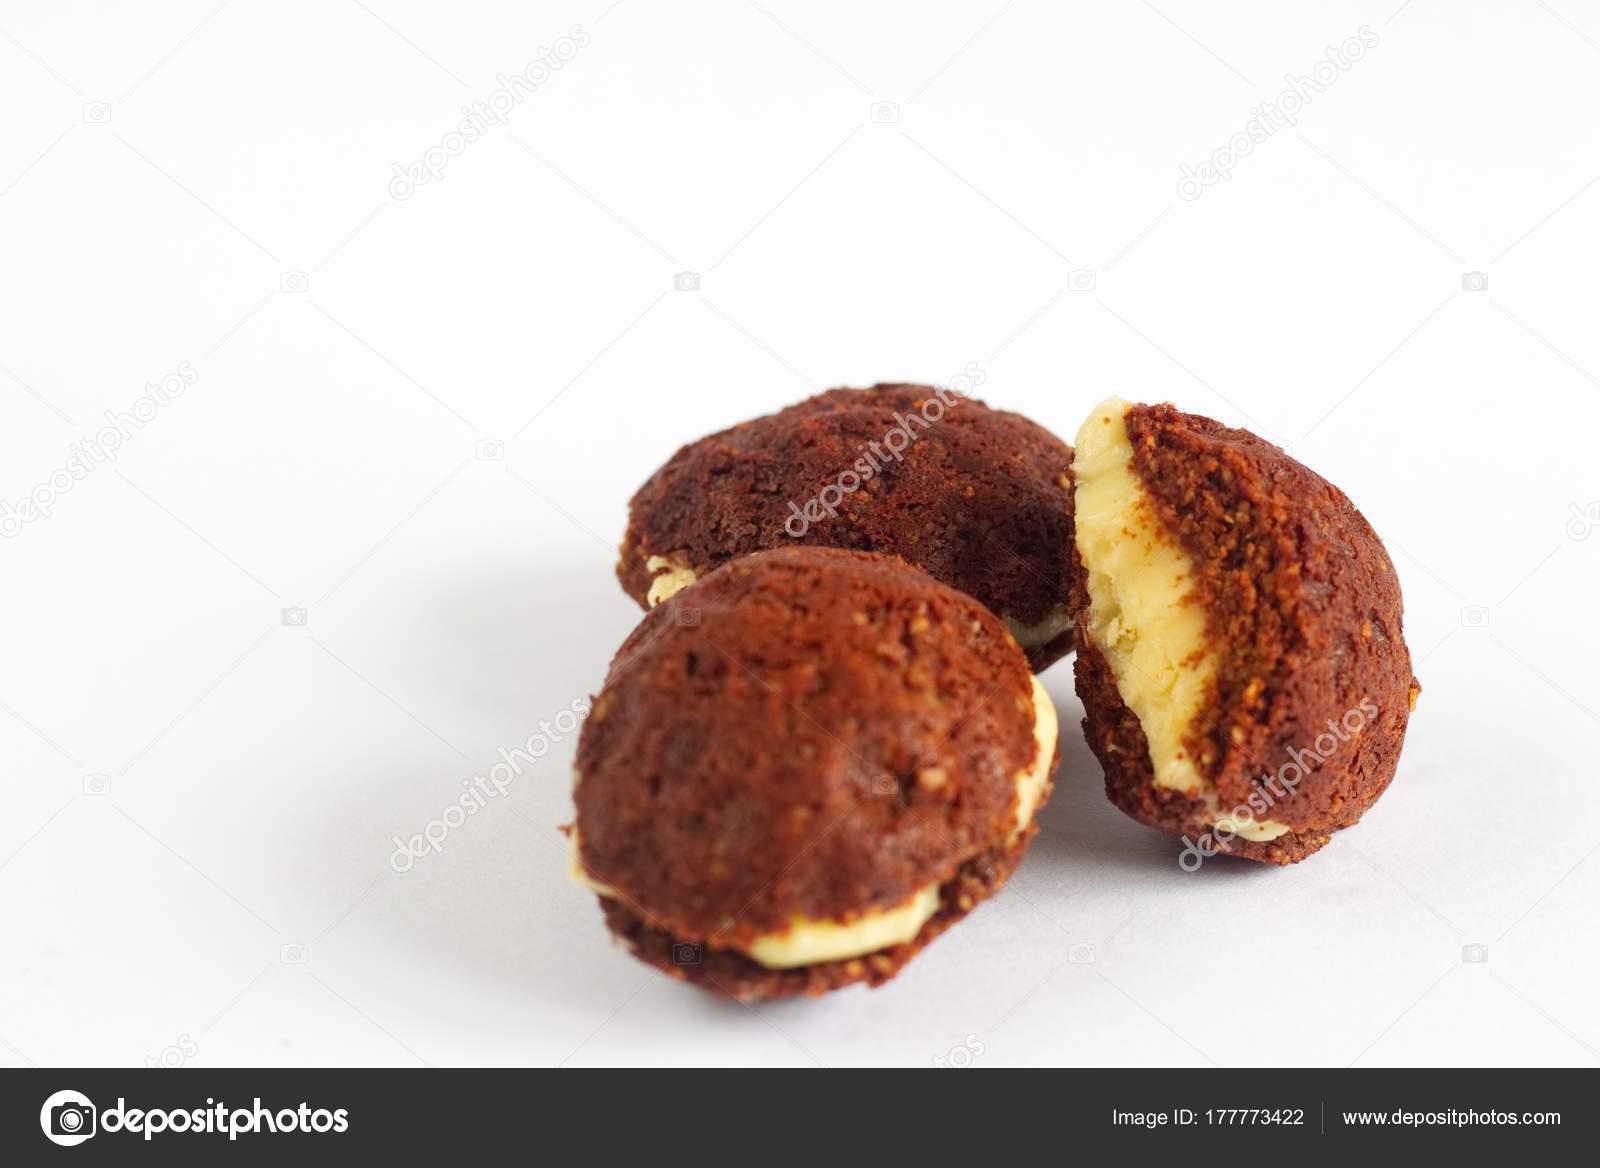 Paleo Weihnachtsgebäck.Handmade Traditional Czech Christmas Sweets Called Nuts Paleo